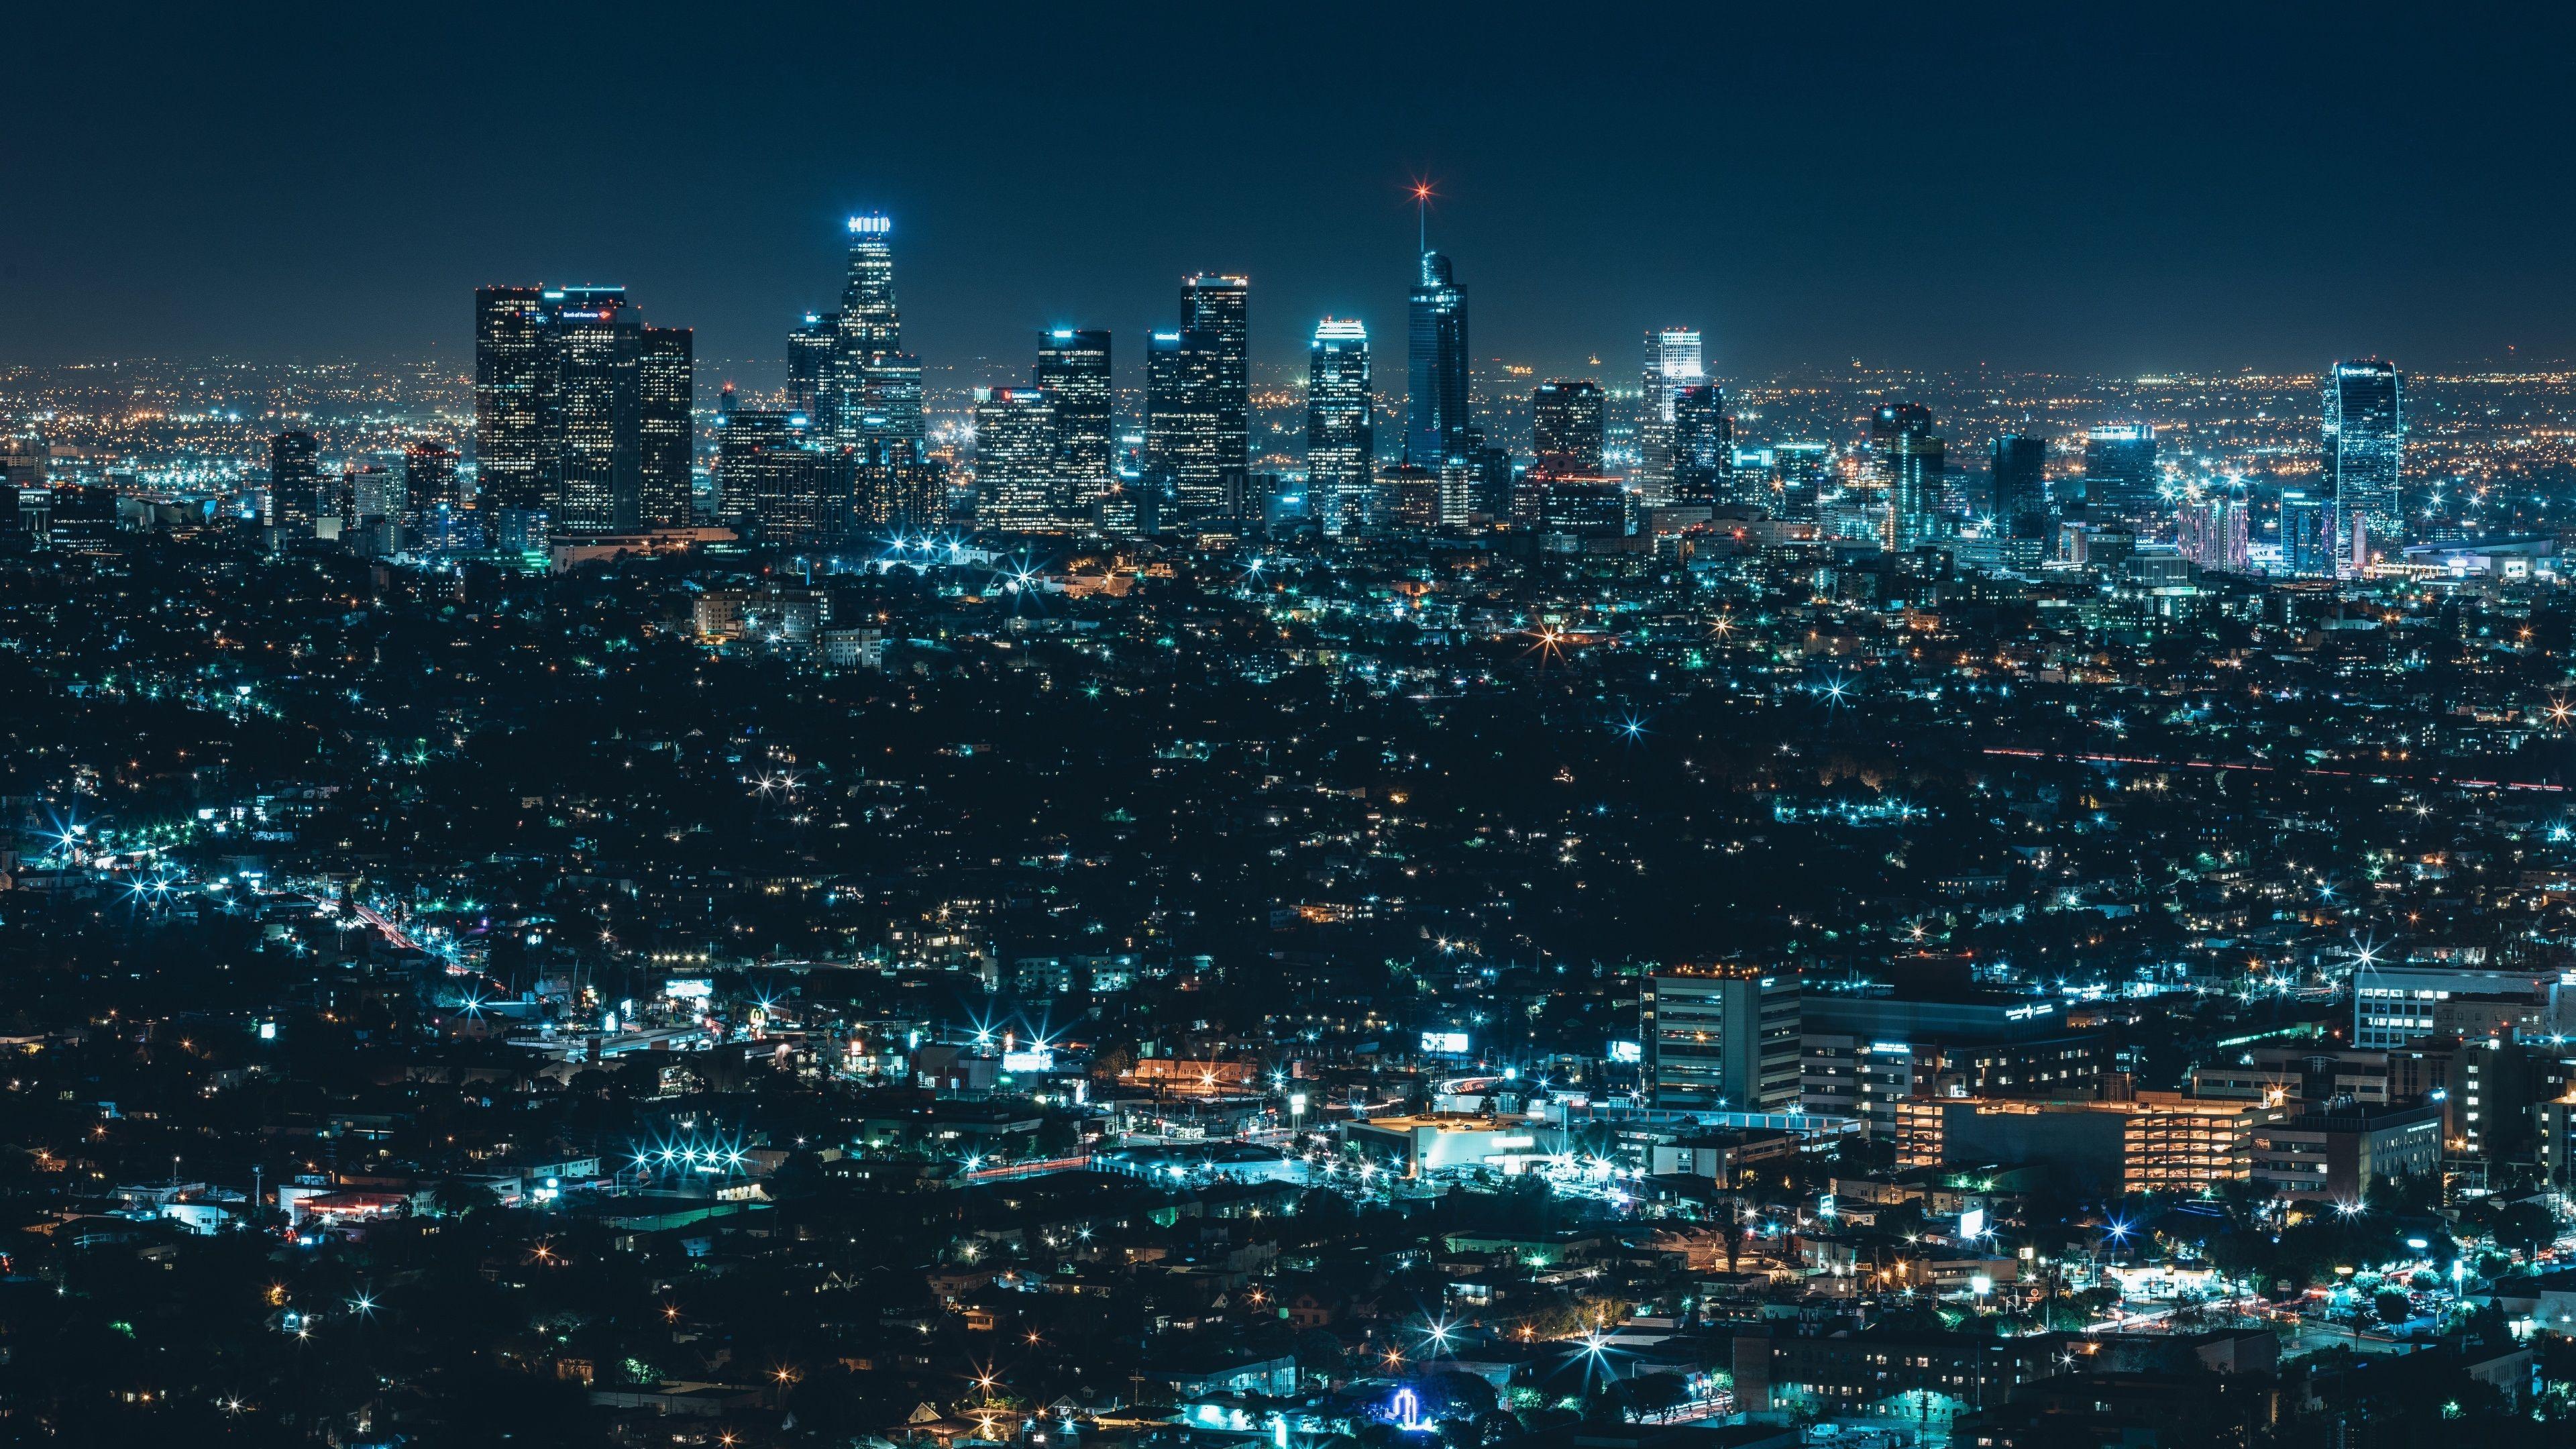 Download Urban Night 4K HD Original Wallpaper With images 4k 3840x2160